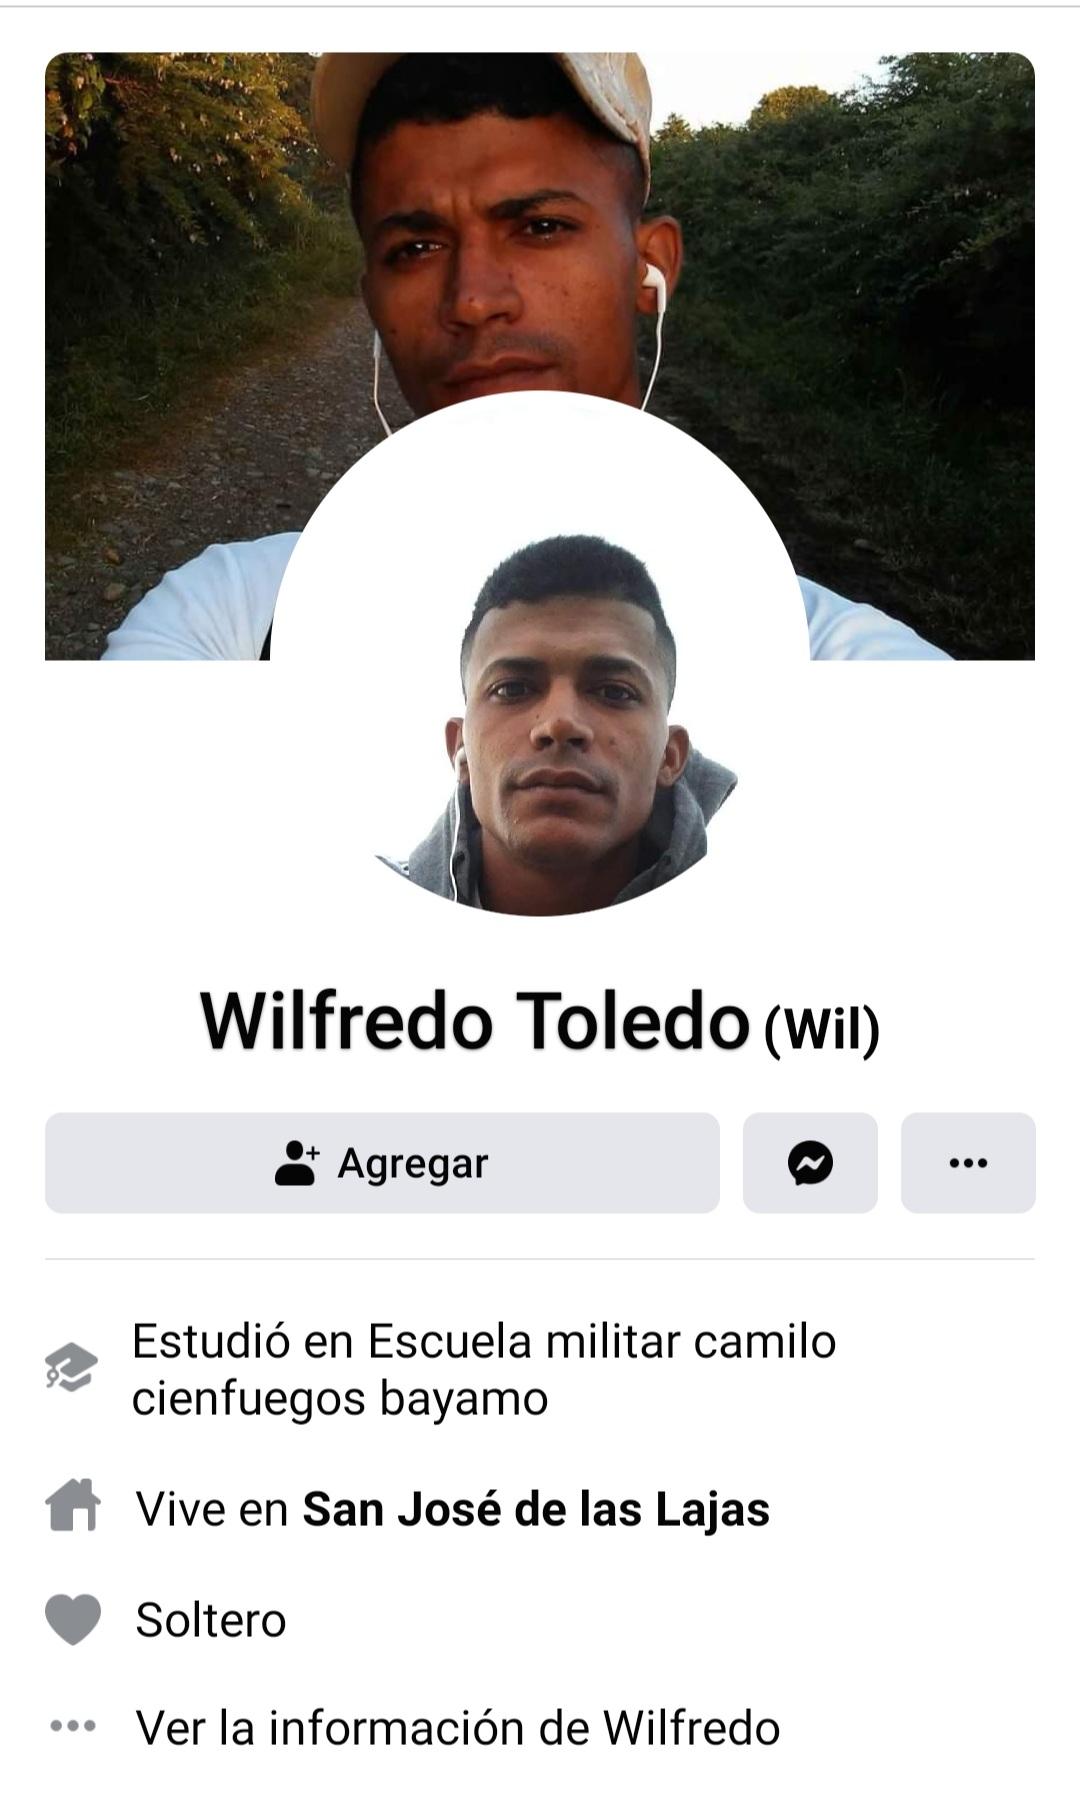 Wilfredo Toledo